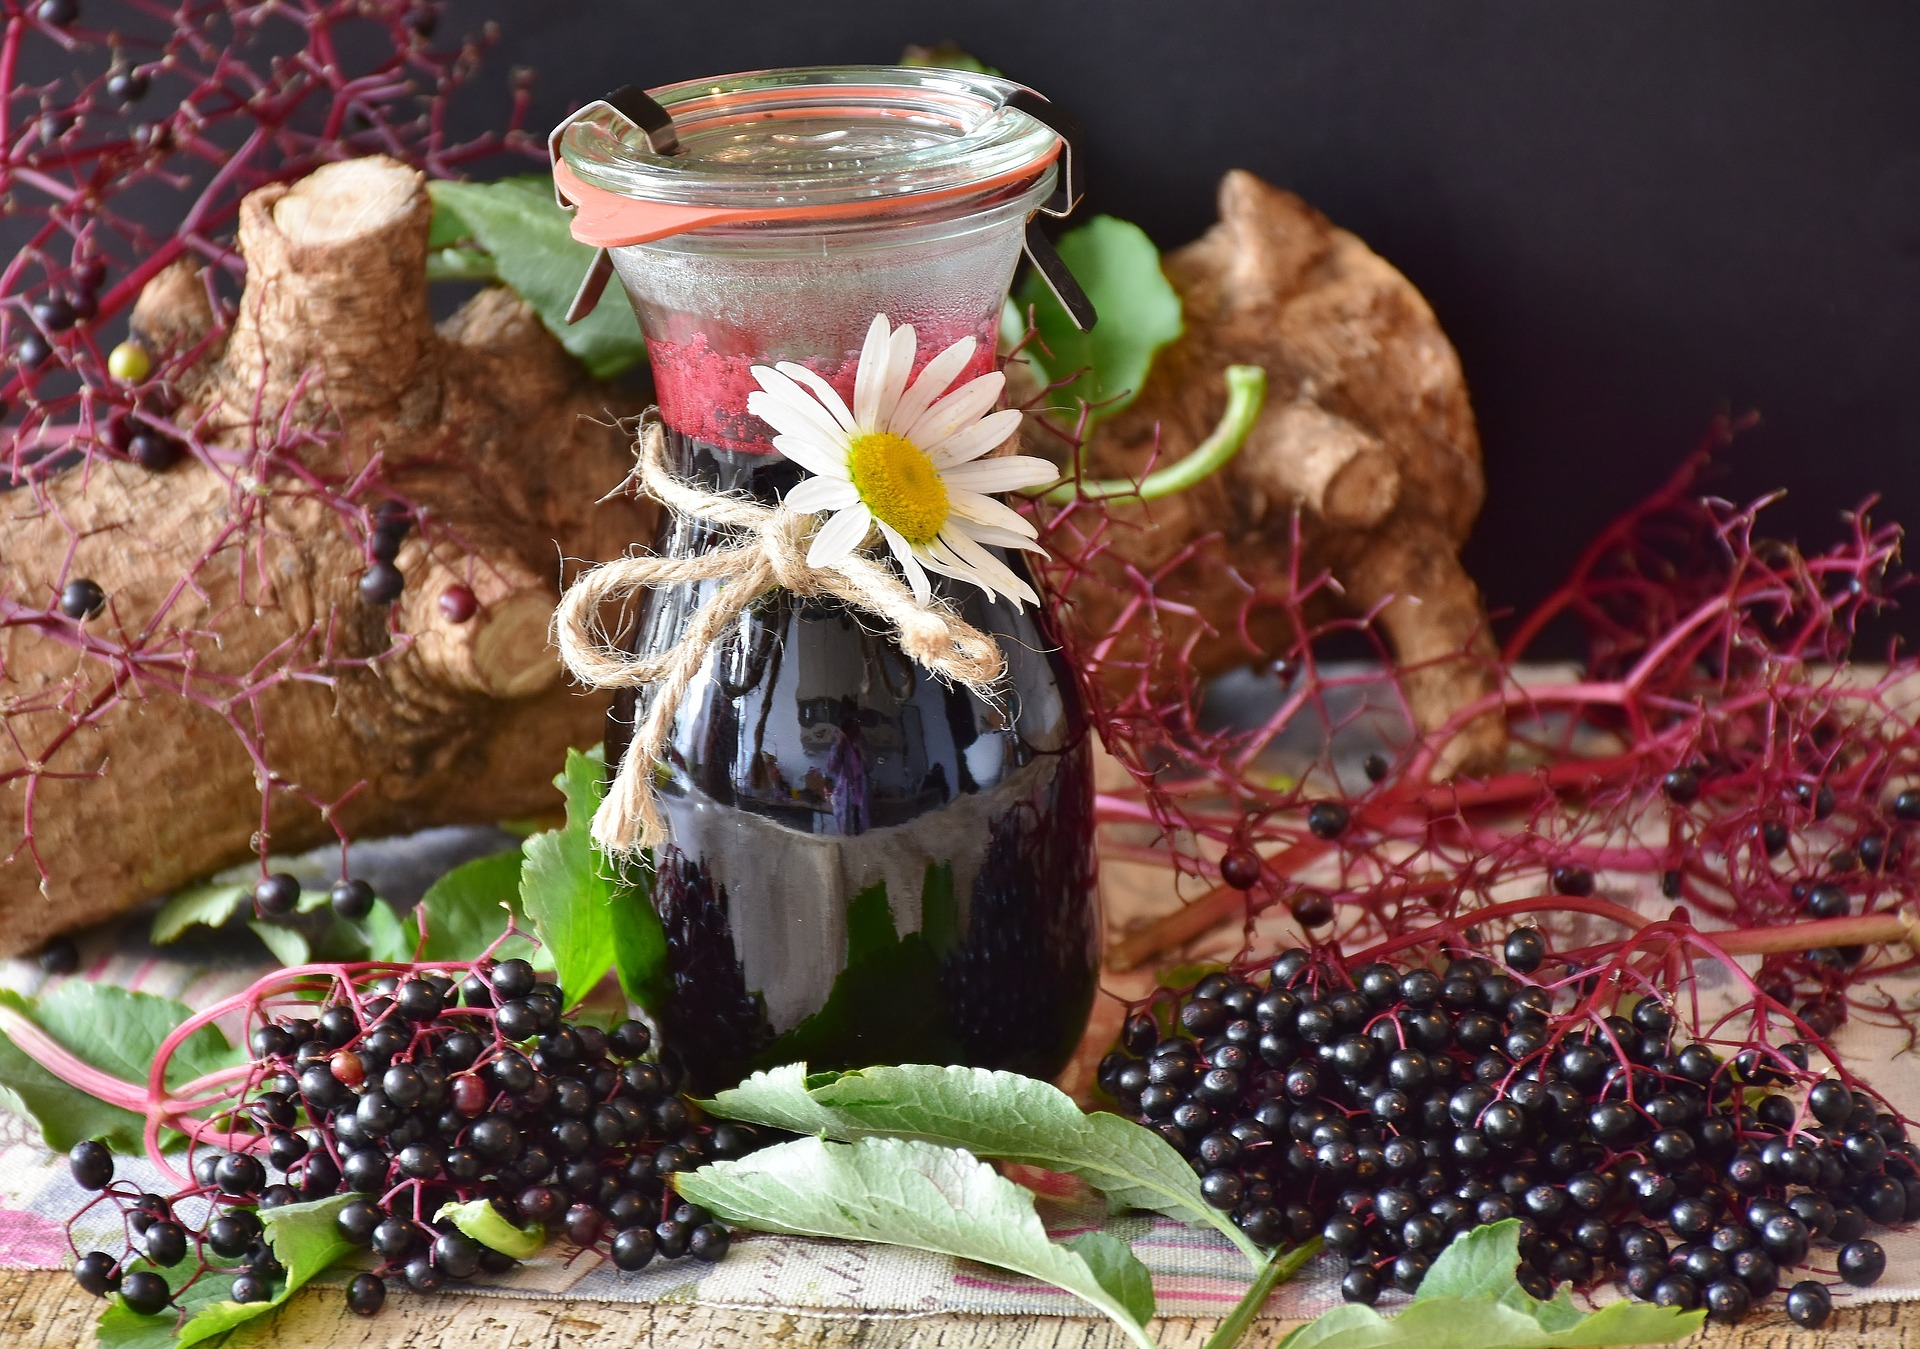 Bezgove jagode proti prehladu